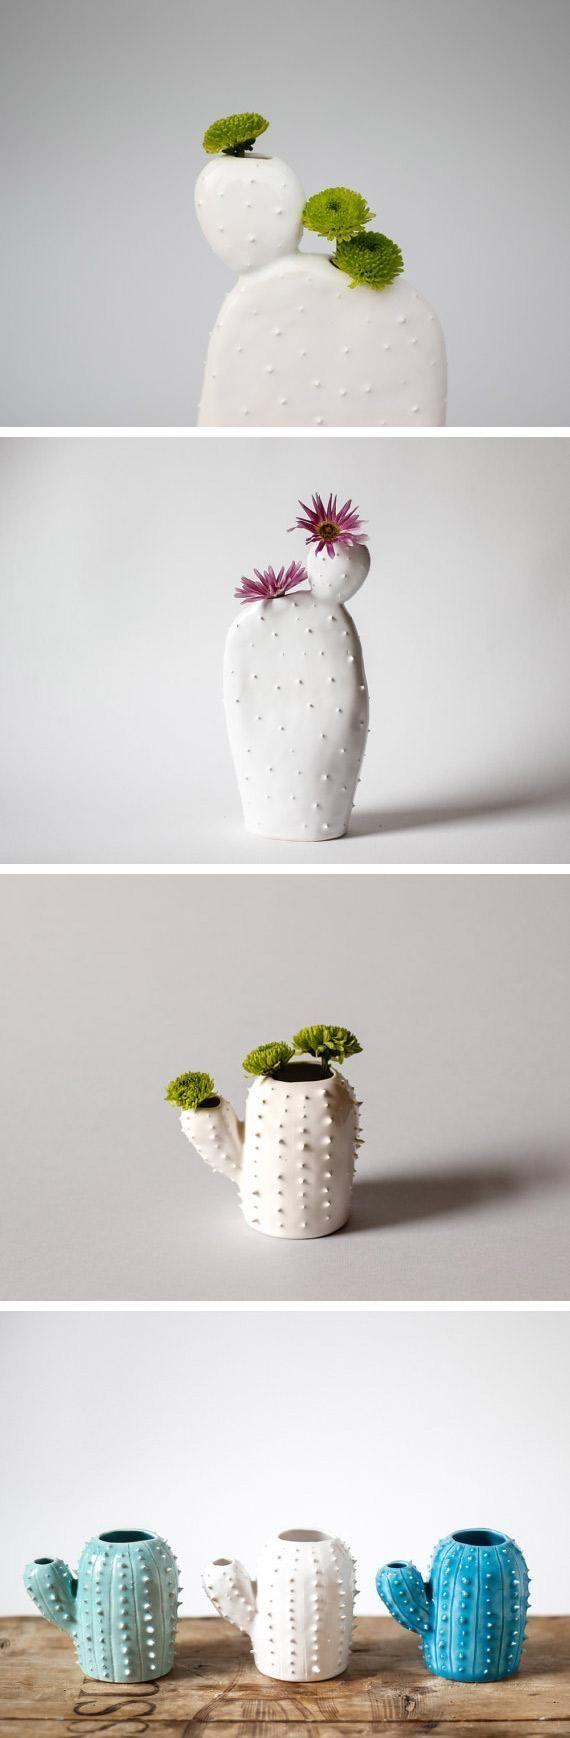 cute cactus planters 귀여운 화분